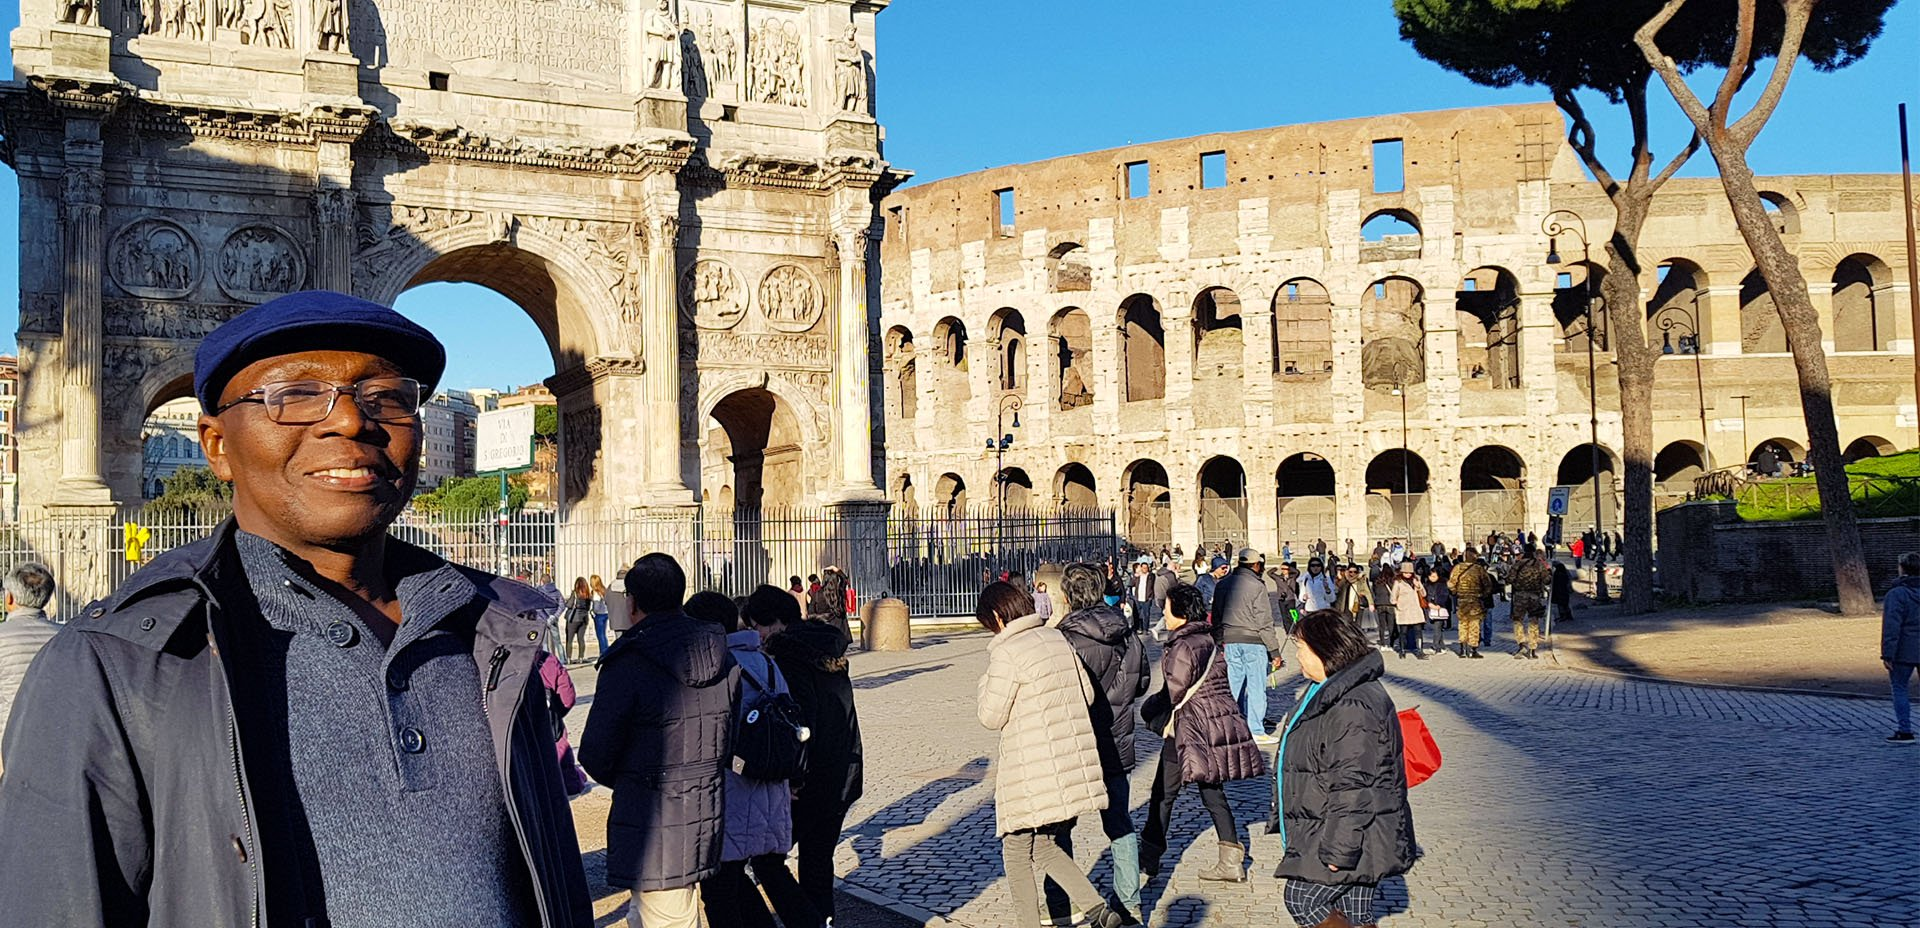 Ben Asamani a Roma, Colosseo